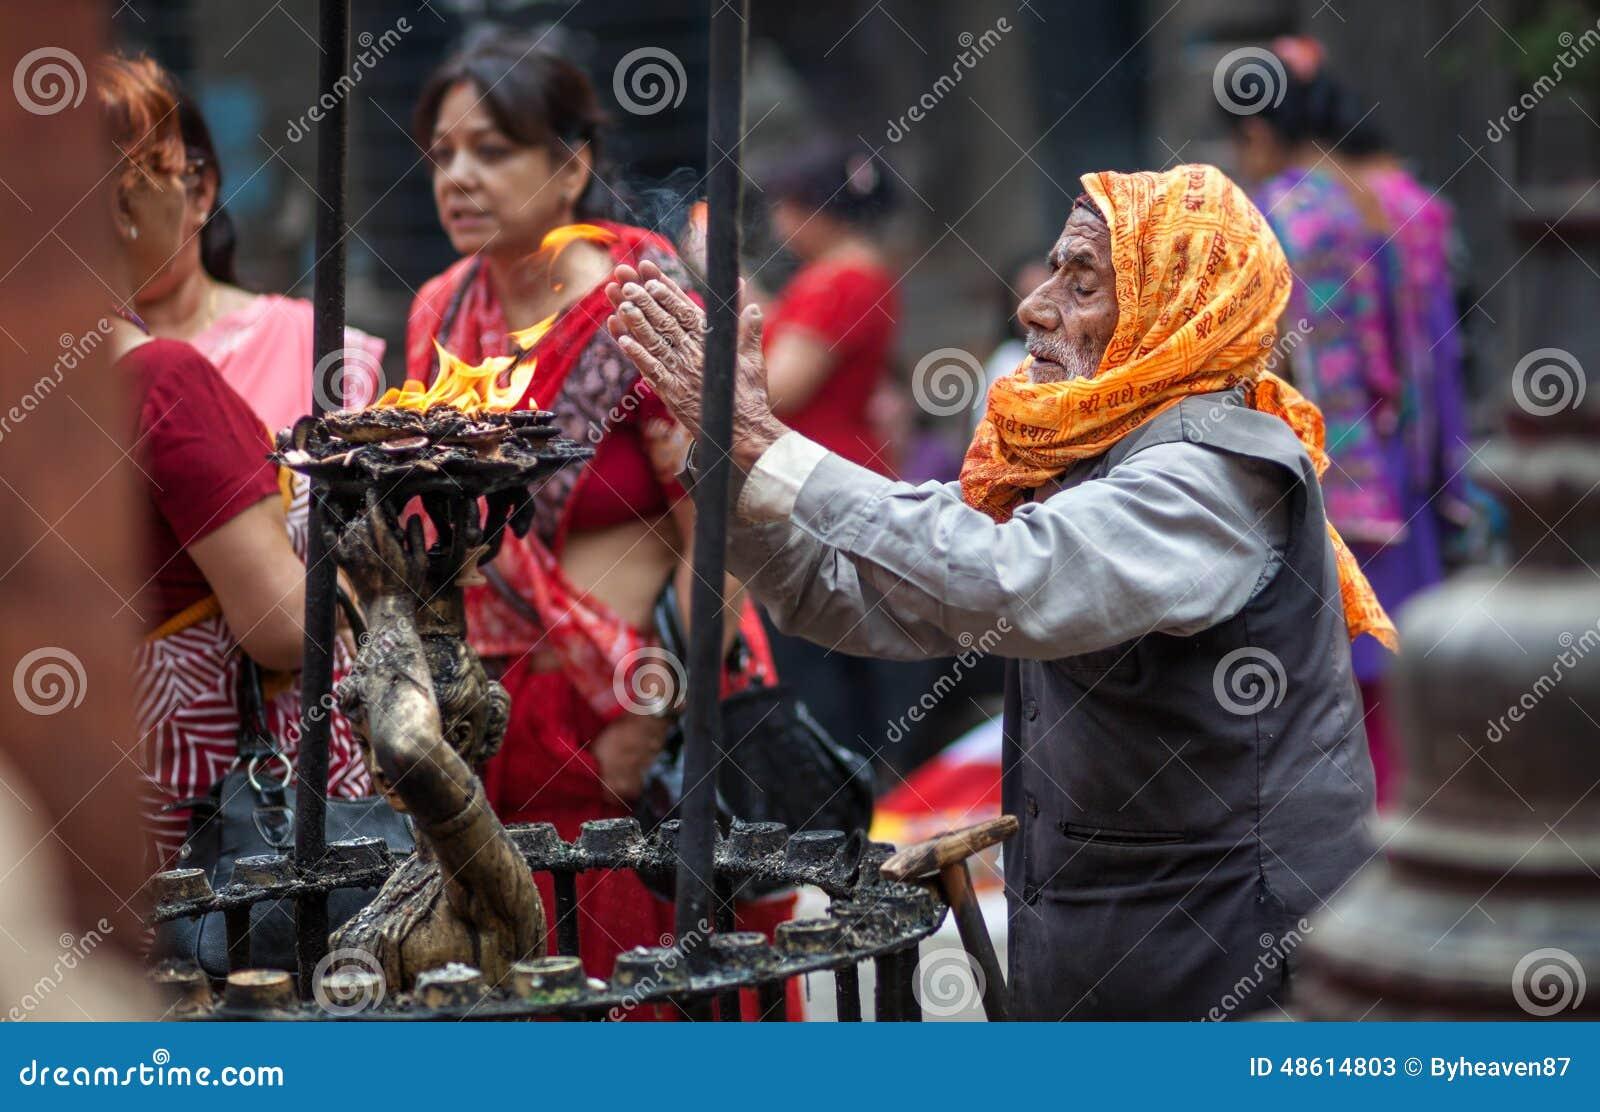 hindu single men in tiff city India girls dating, india single girls online  20-year-old woman seeking men 20-40 single  dating by city.